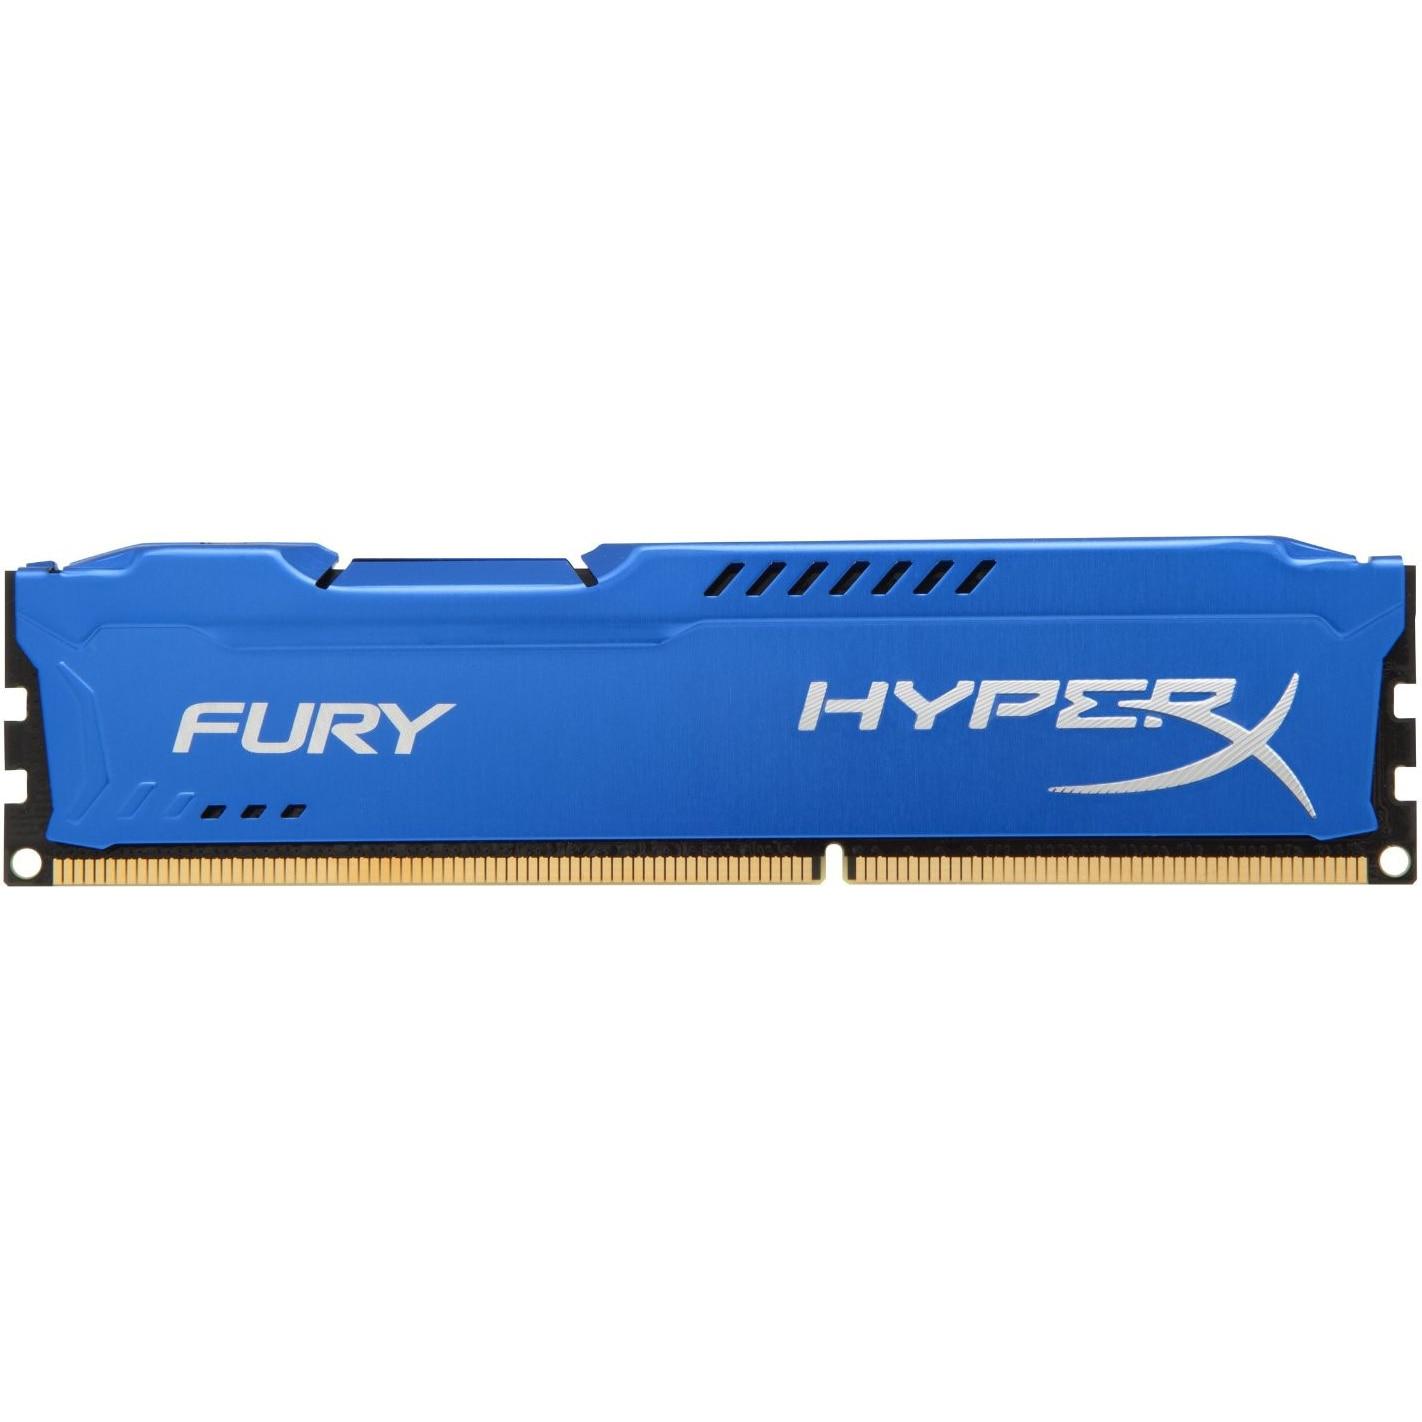 Fotografie Memorie HyperX FURY Blue 4GB, DDR3, 1333MHz, CL9, 1.5V